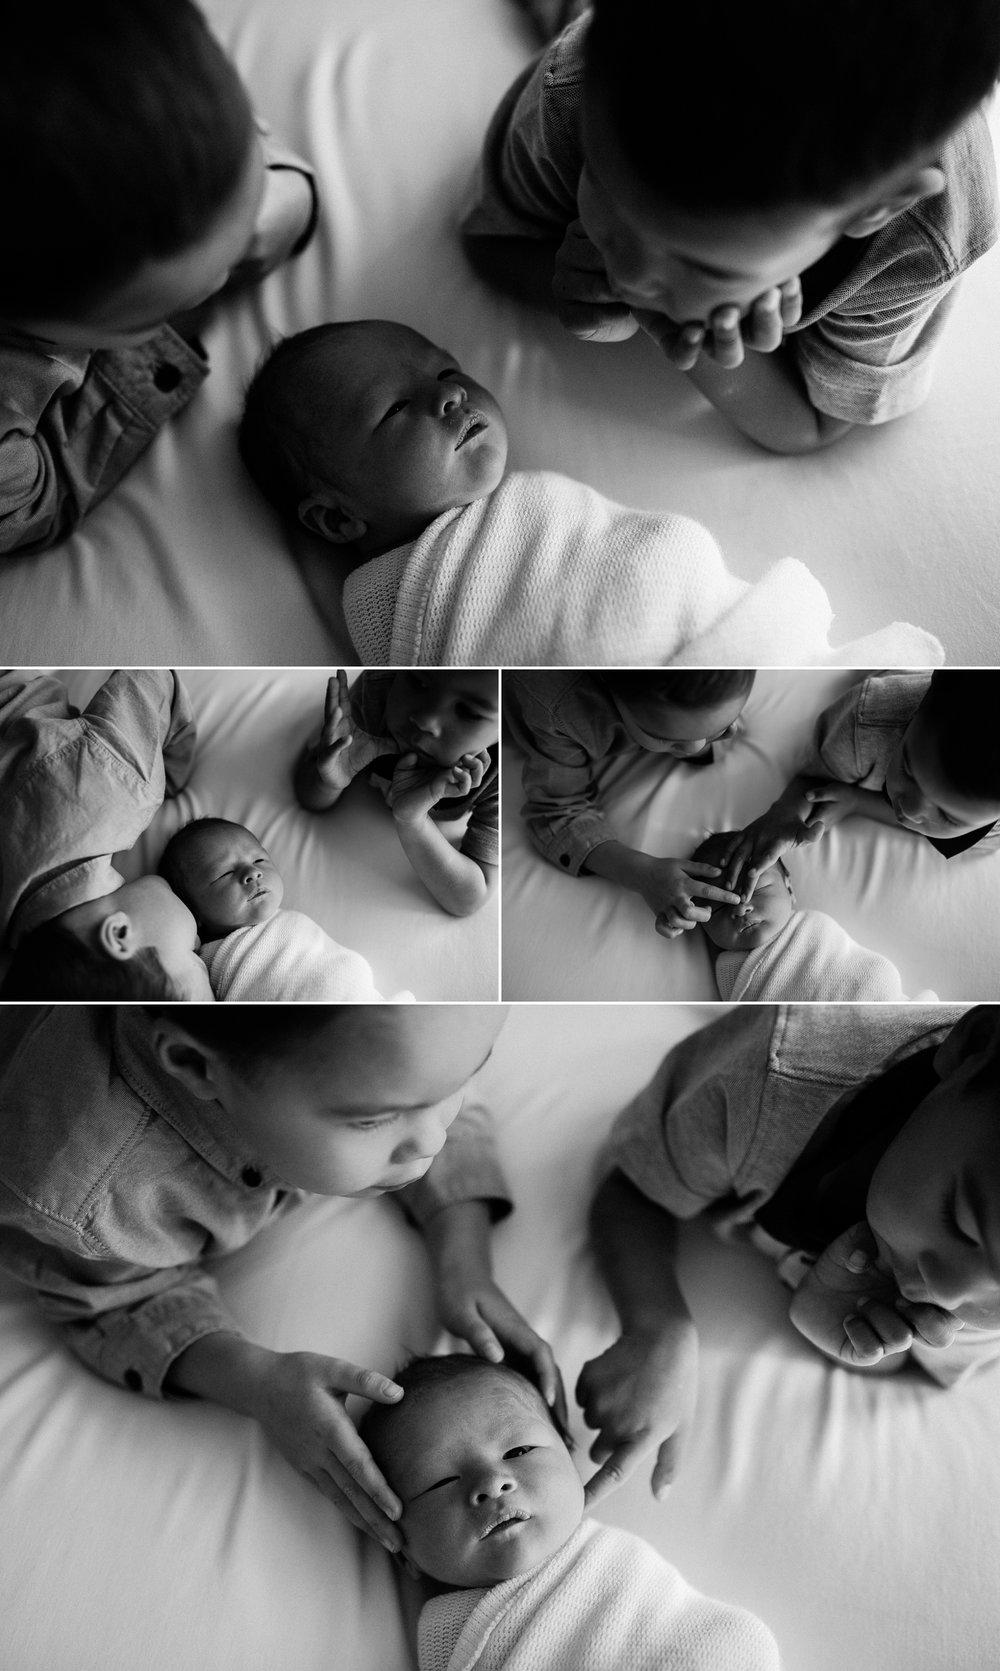 Sebastian - Natural light newborn photographer in Adelaide - Simple newborn photography - Katherine Schultz www.katherineschultzphotography.com 10